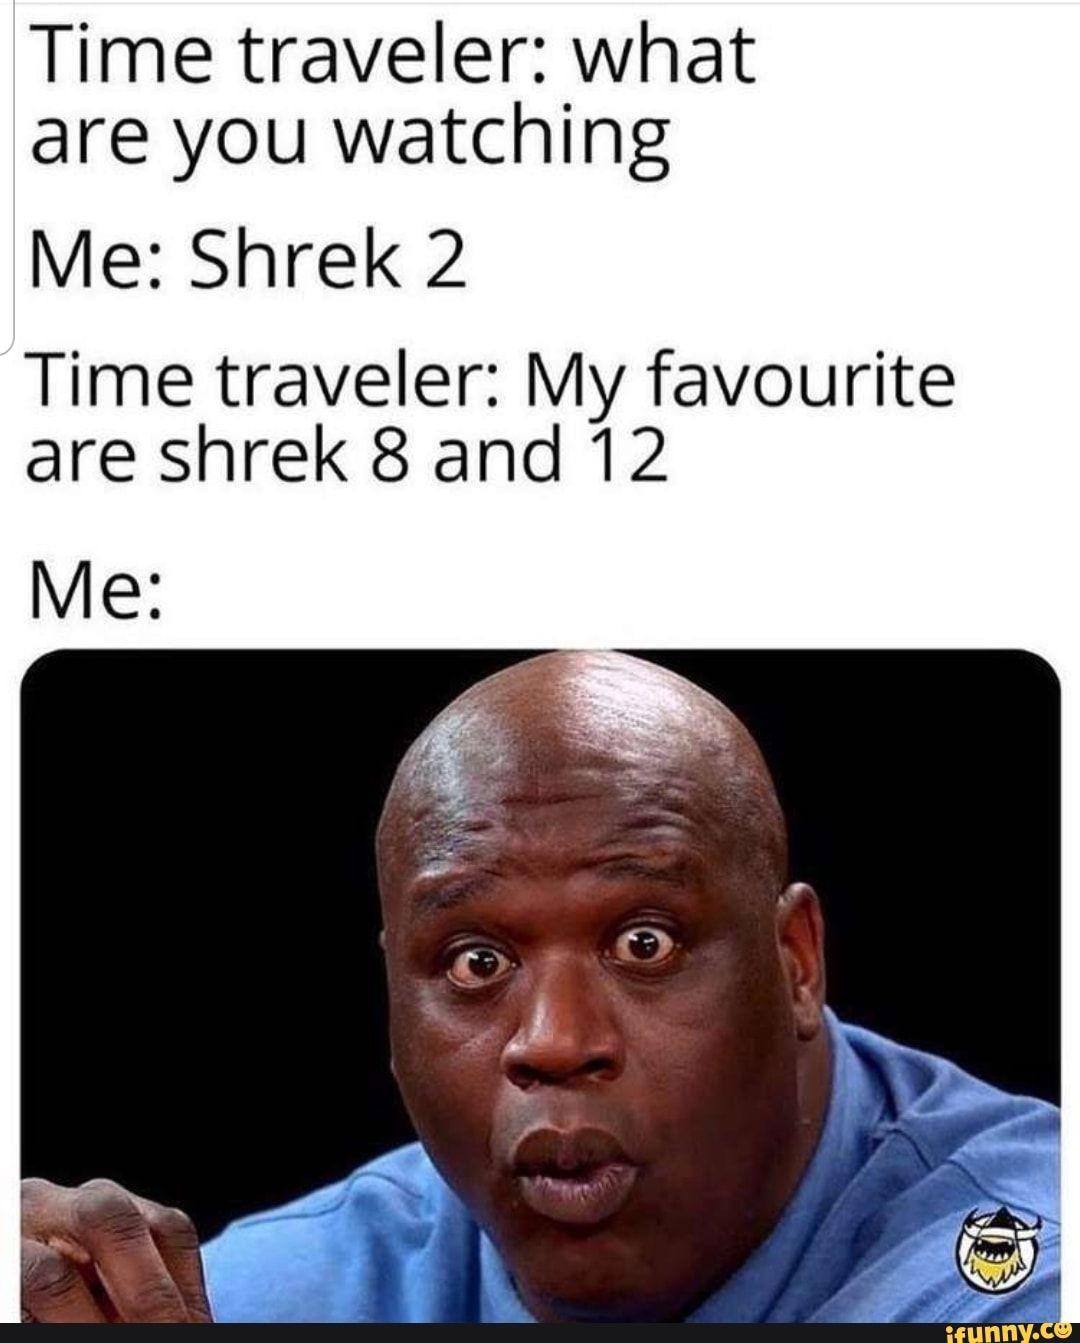 Time Traveler What Are You Watching Me Shrek 2 Time Traveler My Favourite Are Shrek 8 And 12 Ifunny Shrek Memes Humor Dankest Memes